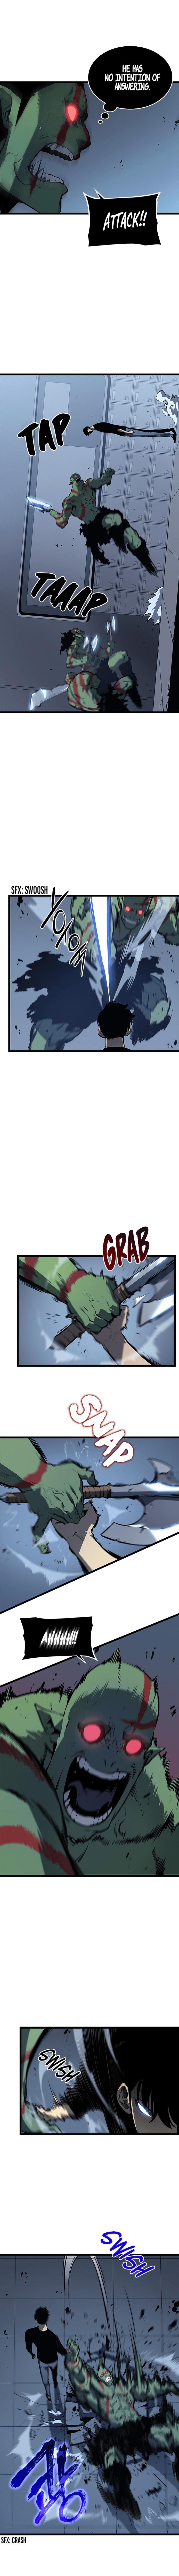 Manga Solo Leveling - Chapter 120 Page 4